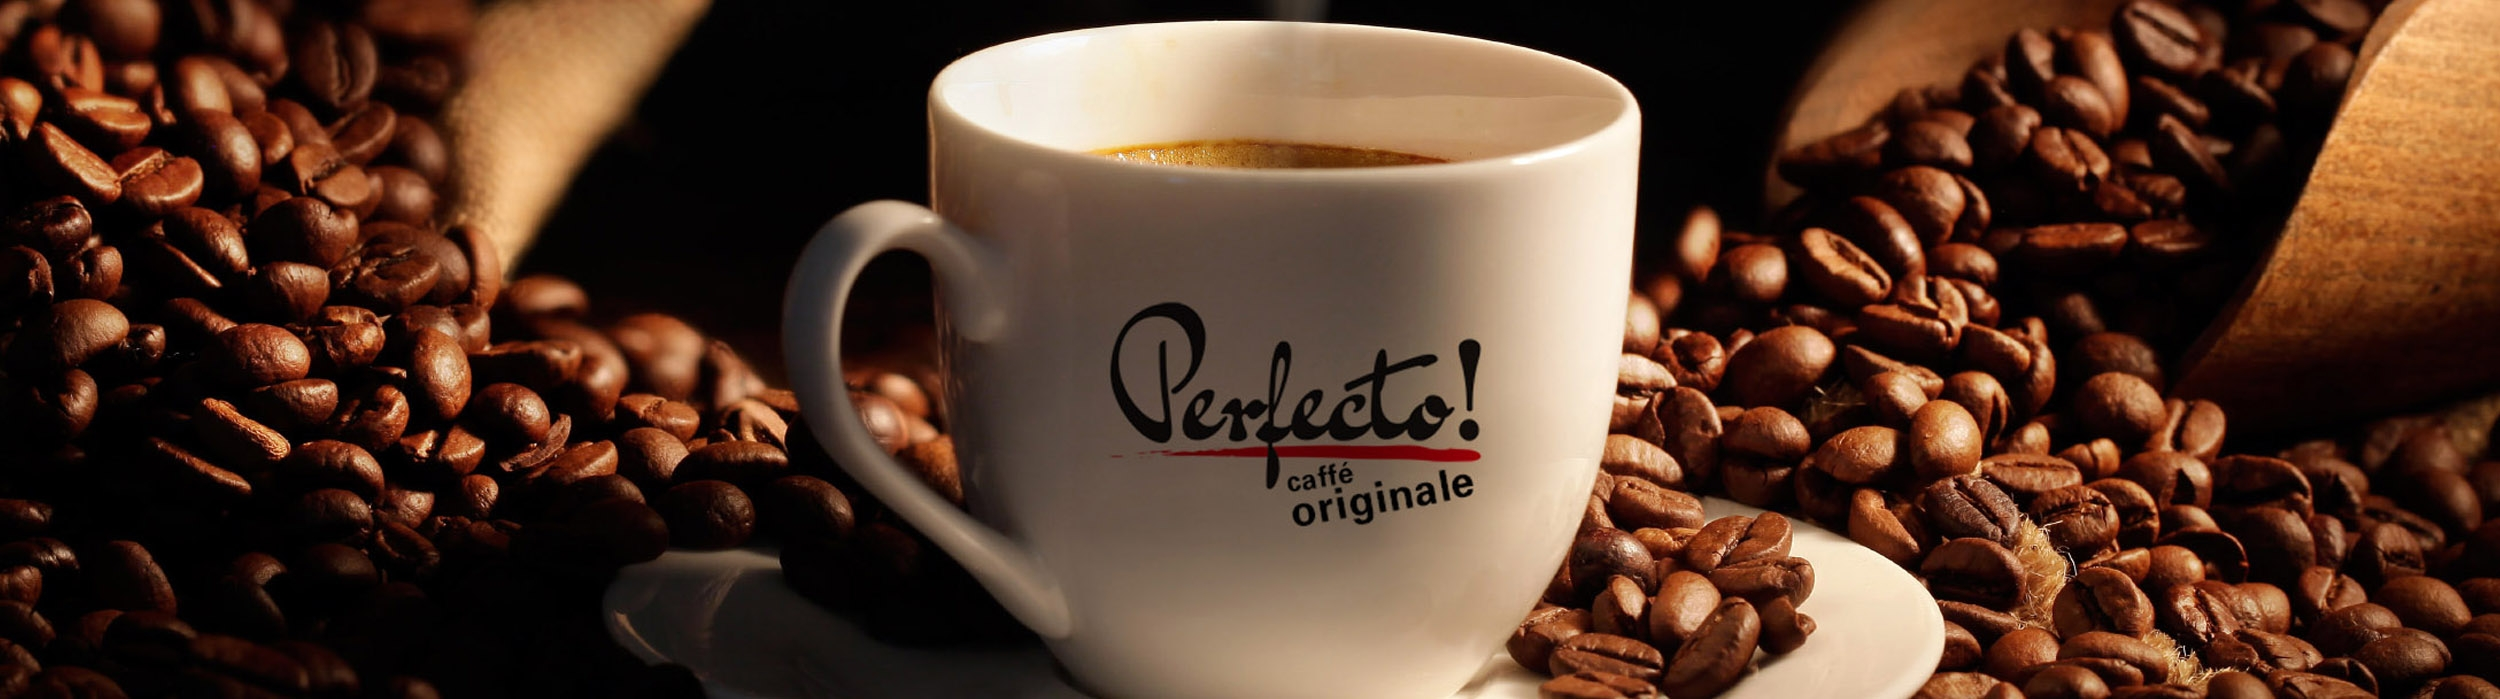 Perfecto Caffé Smaakvol Koffieconcept Perfecto Caffé